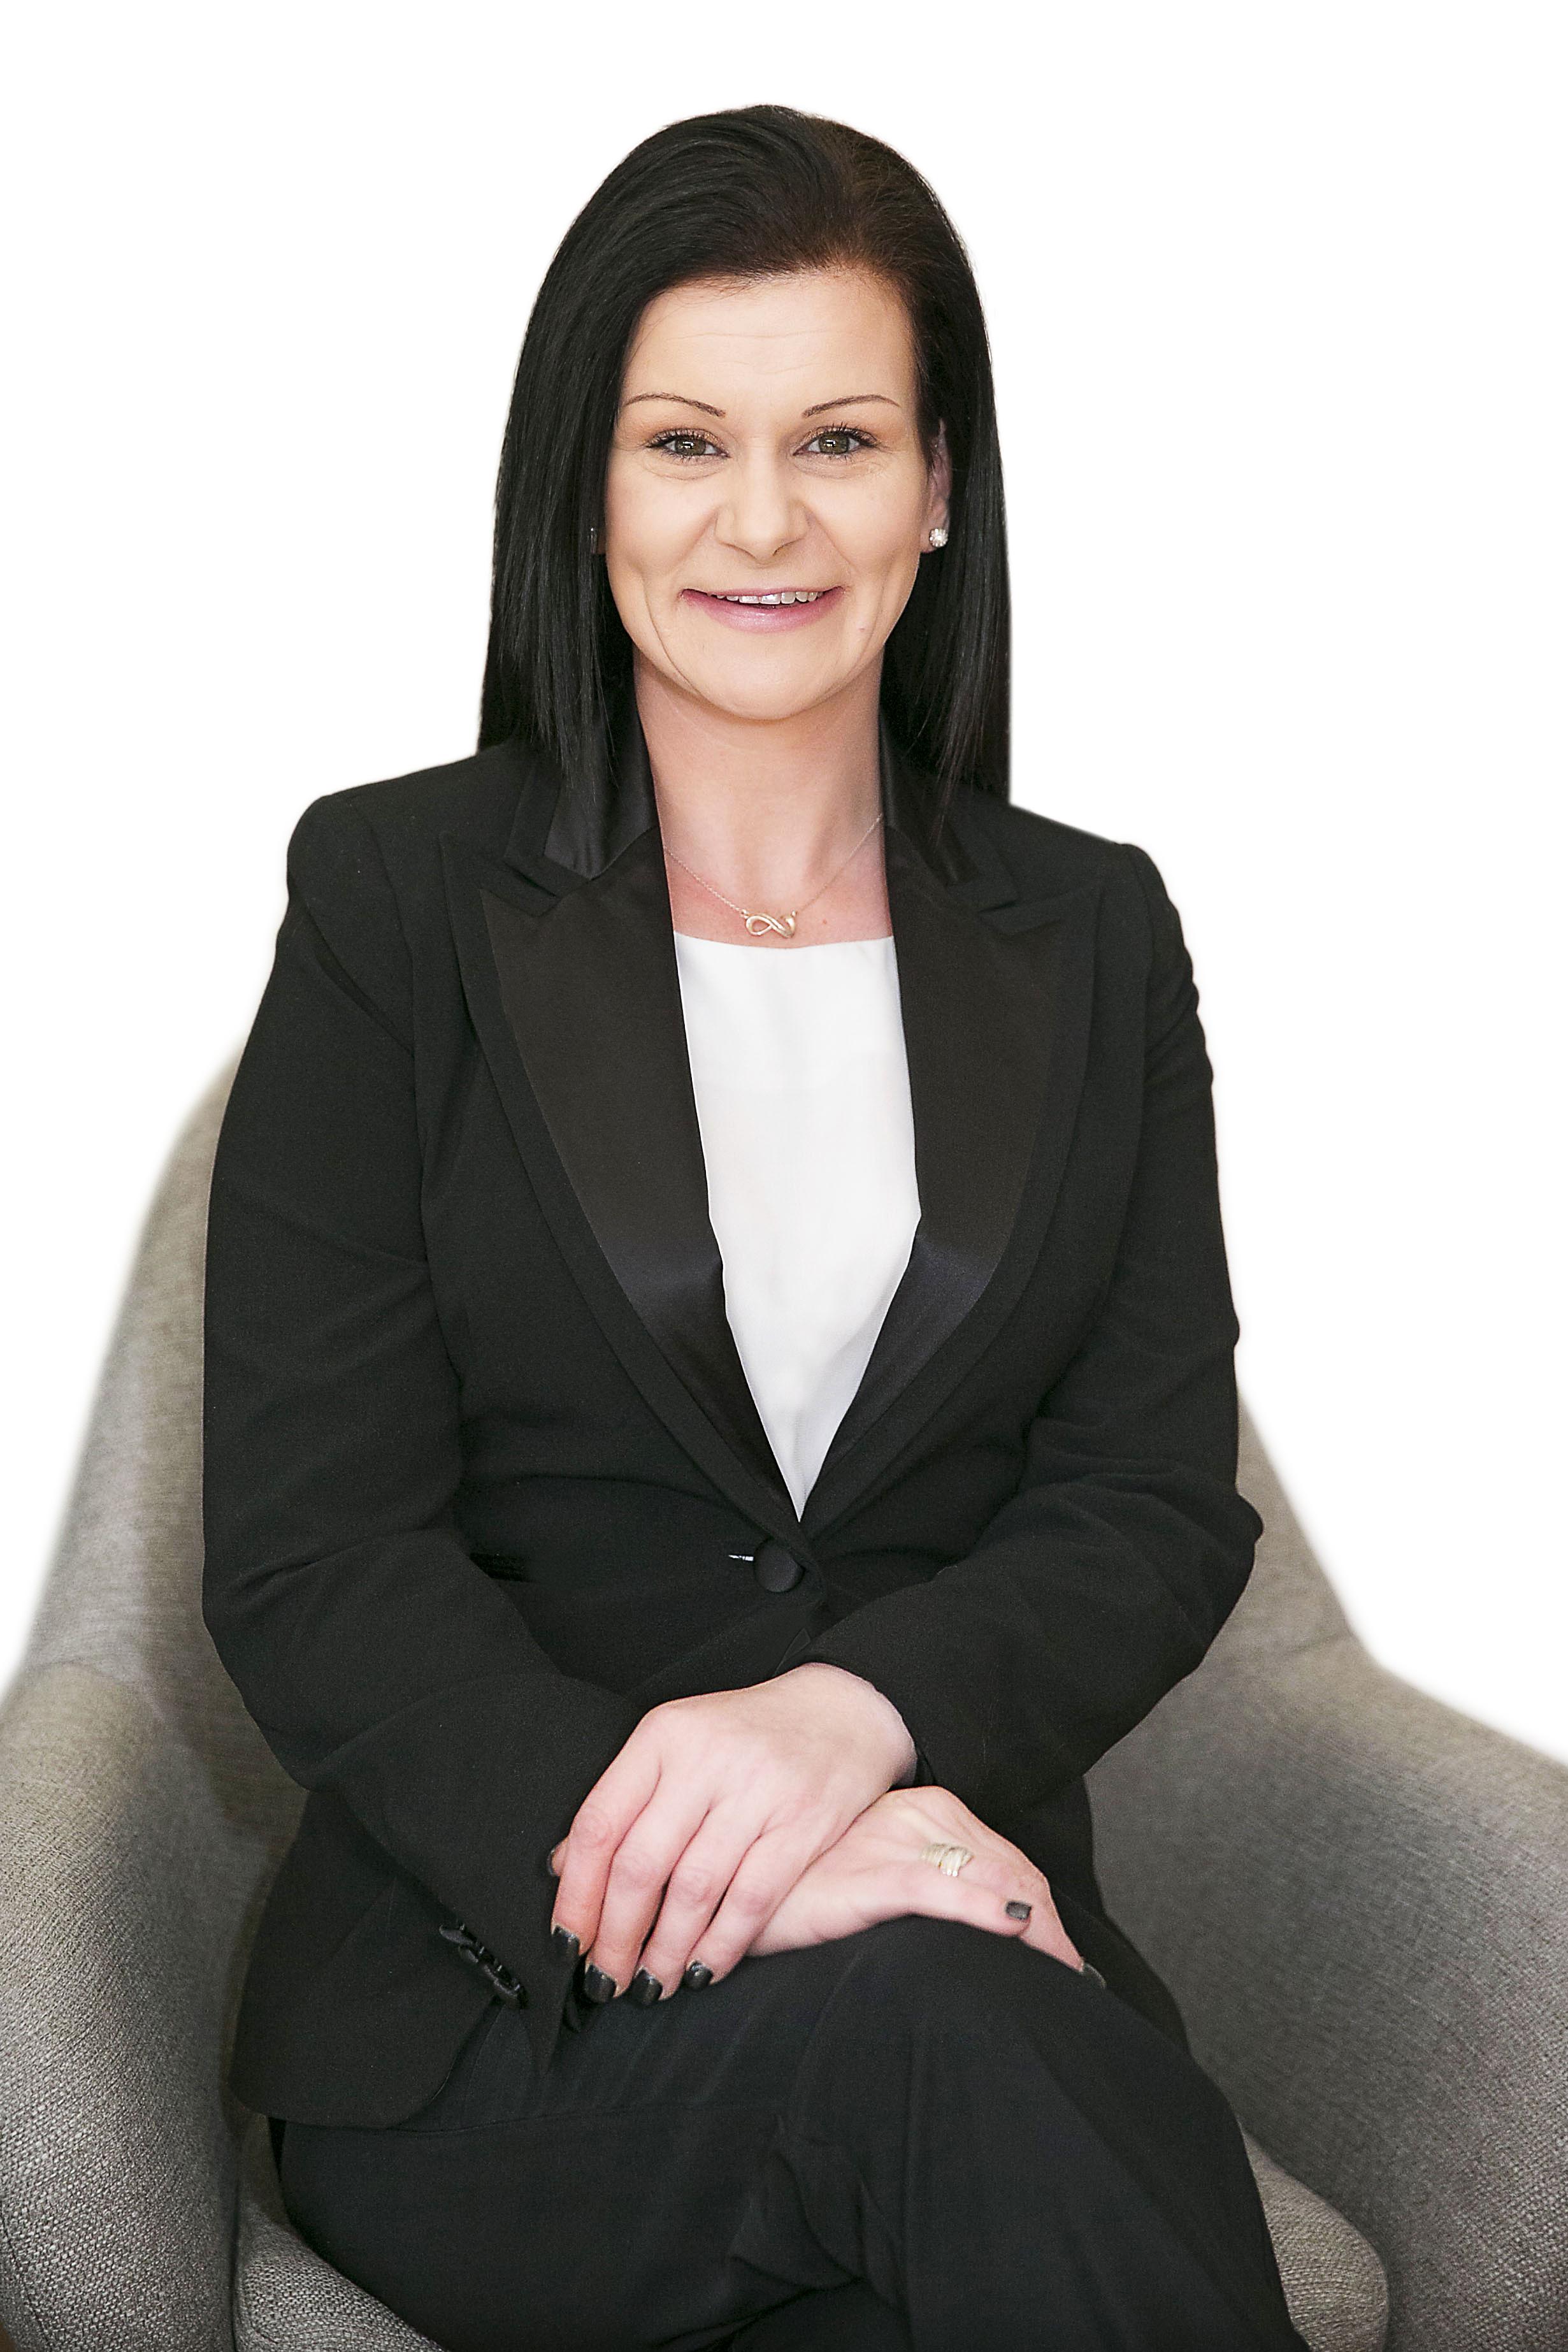 Bianca Bowden